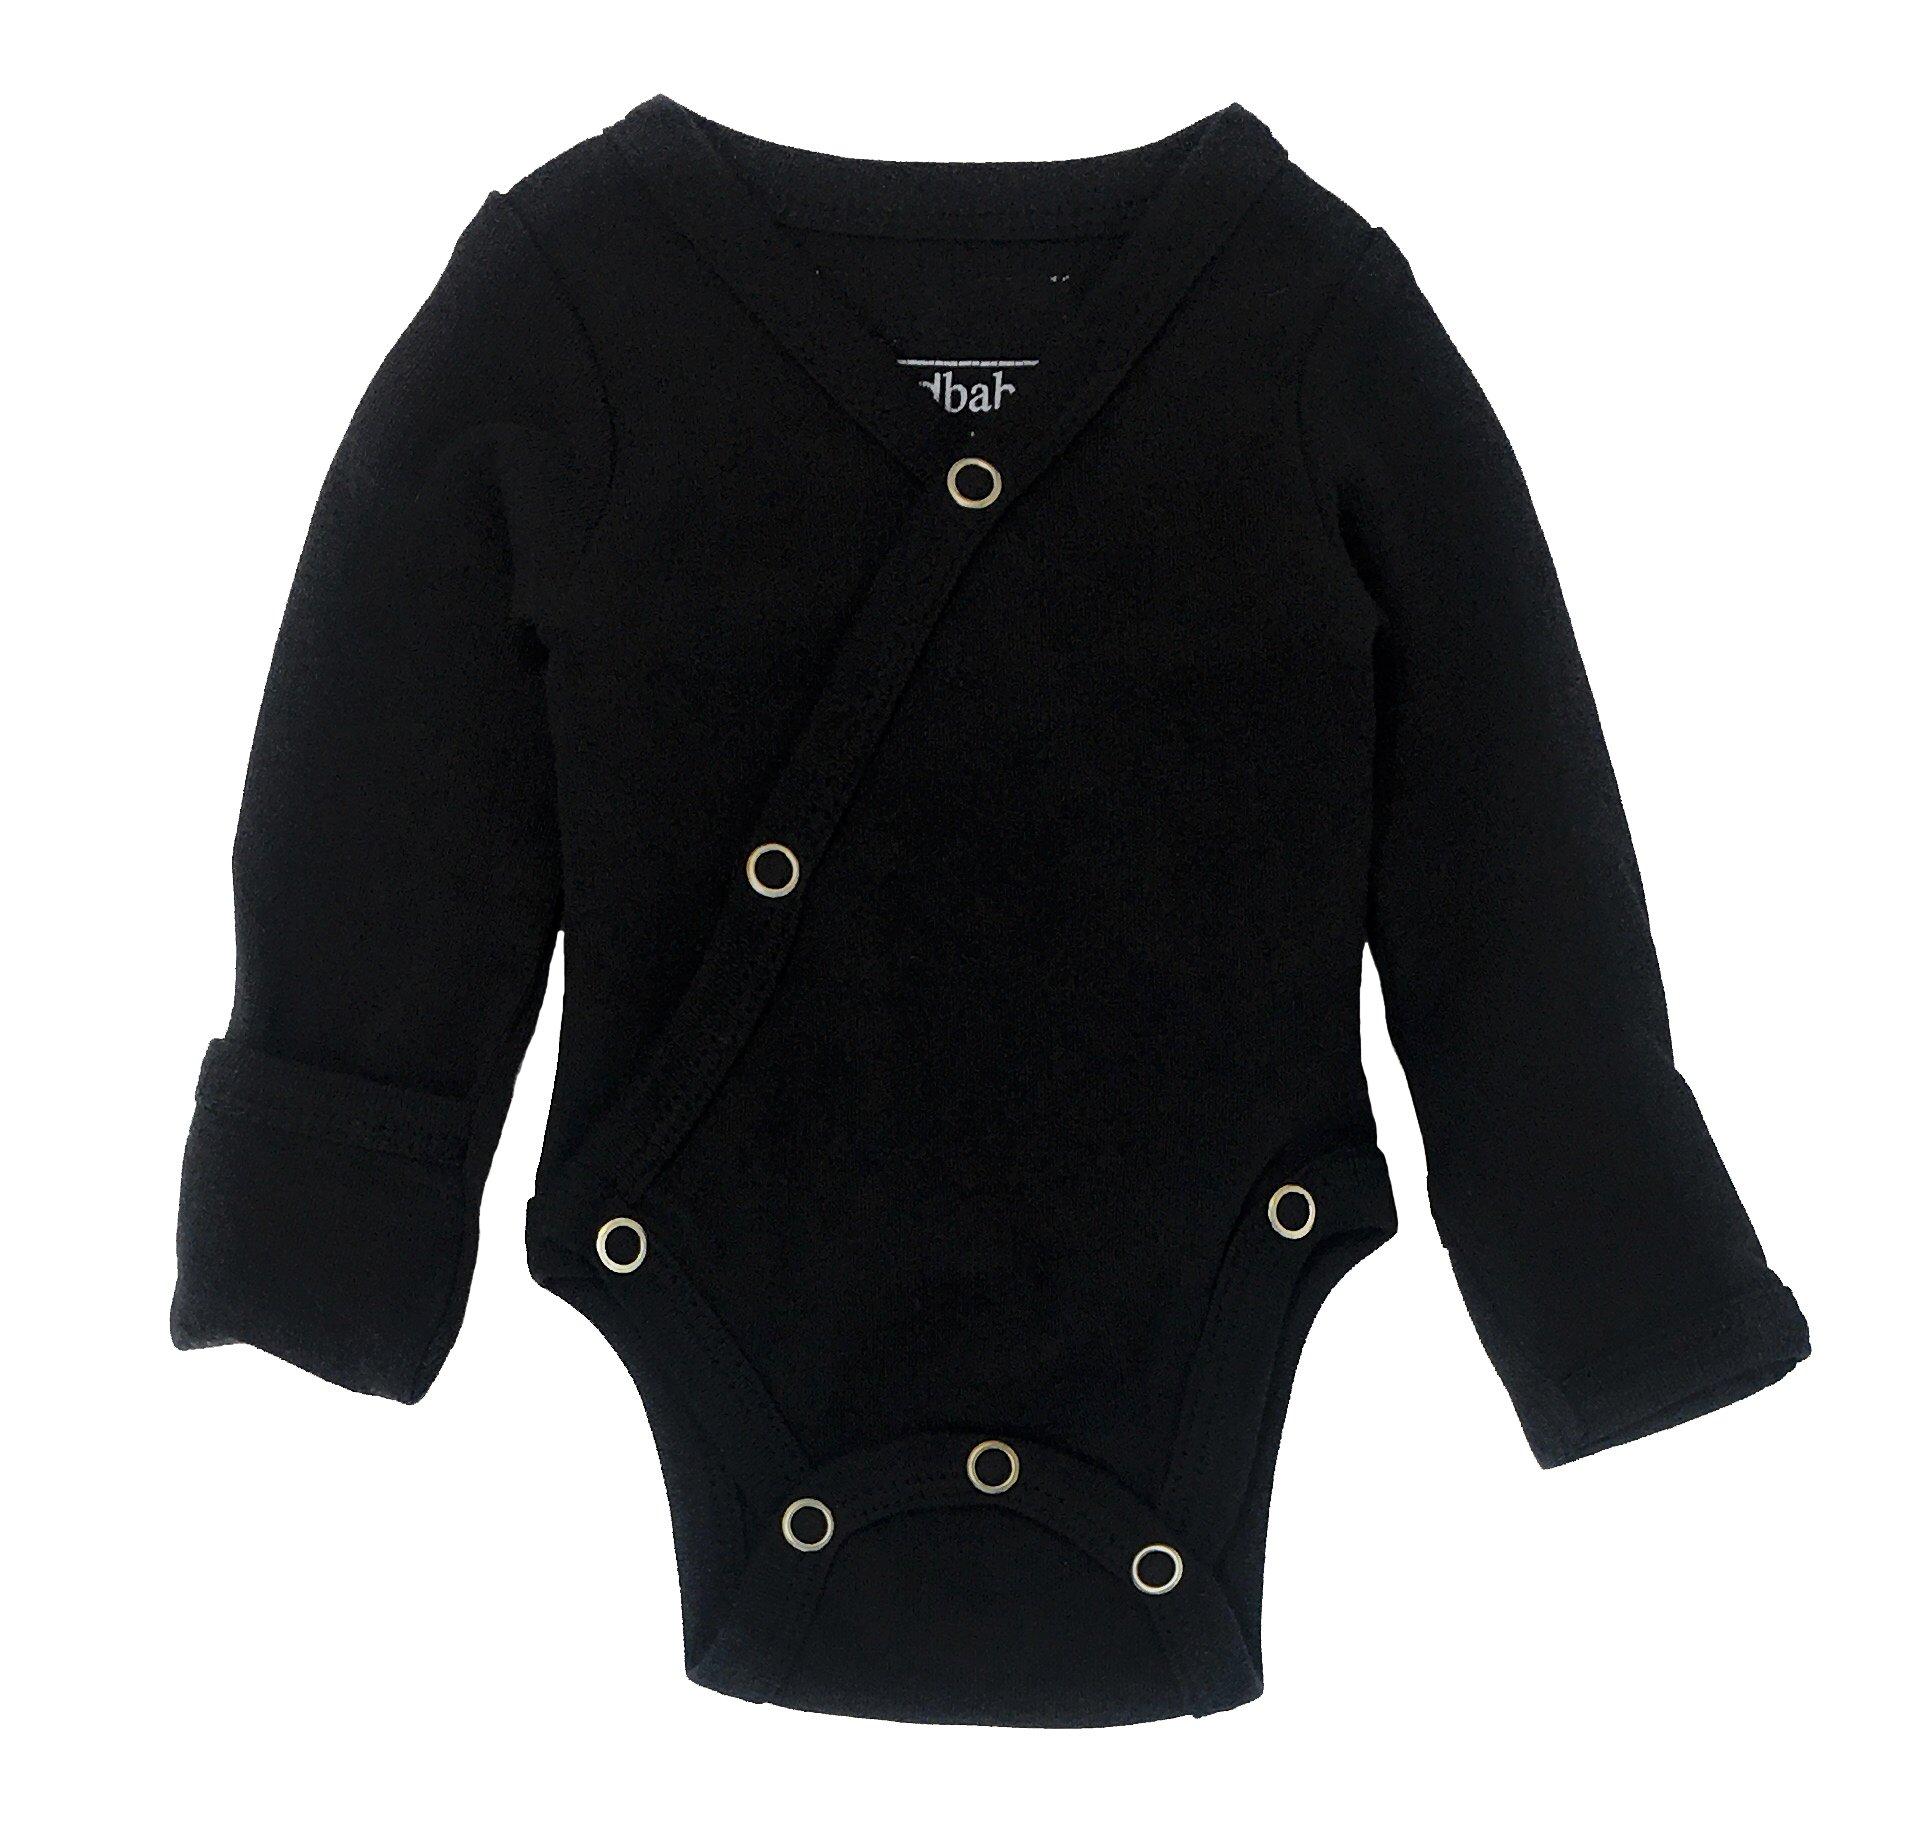 L'ovedbaby Unisex Baby Organic Cotton Kimono Bodysuit (3-6 Months, Black)